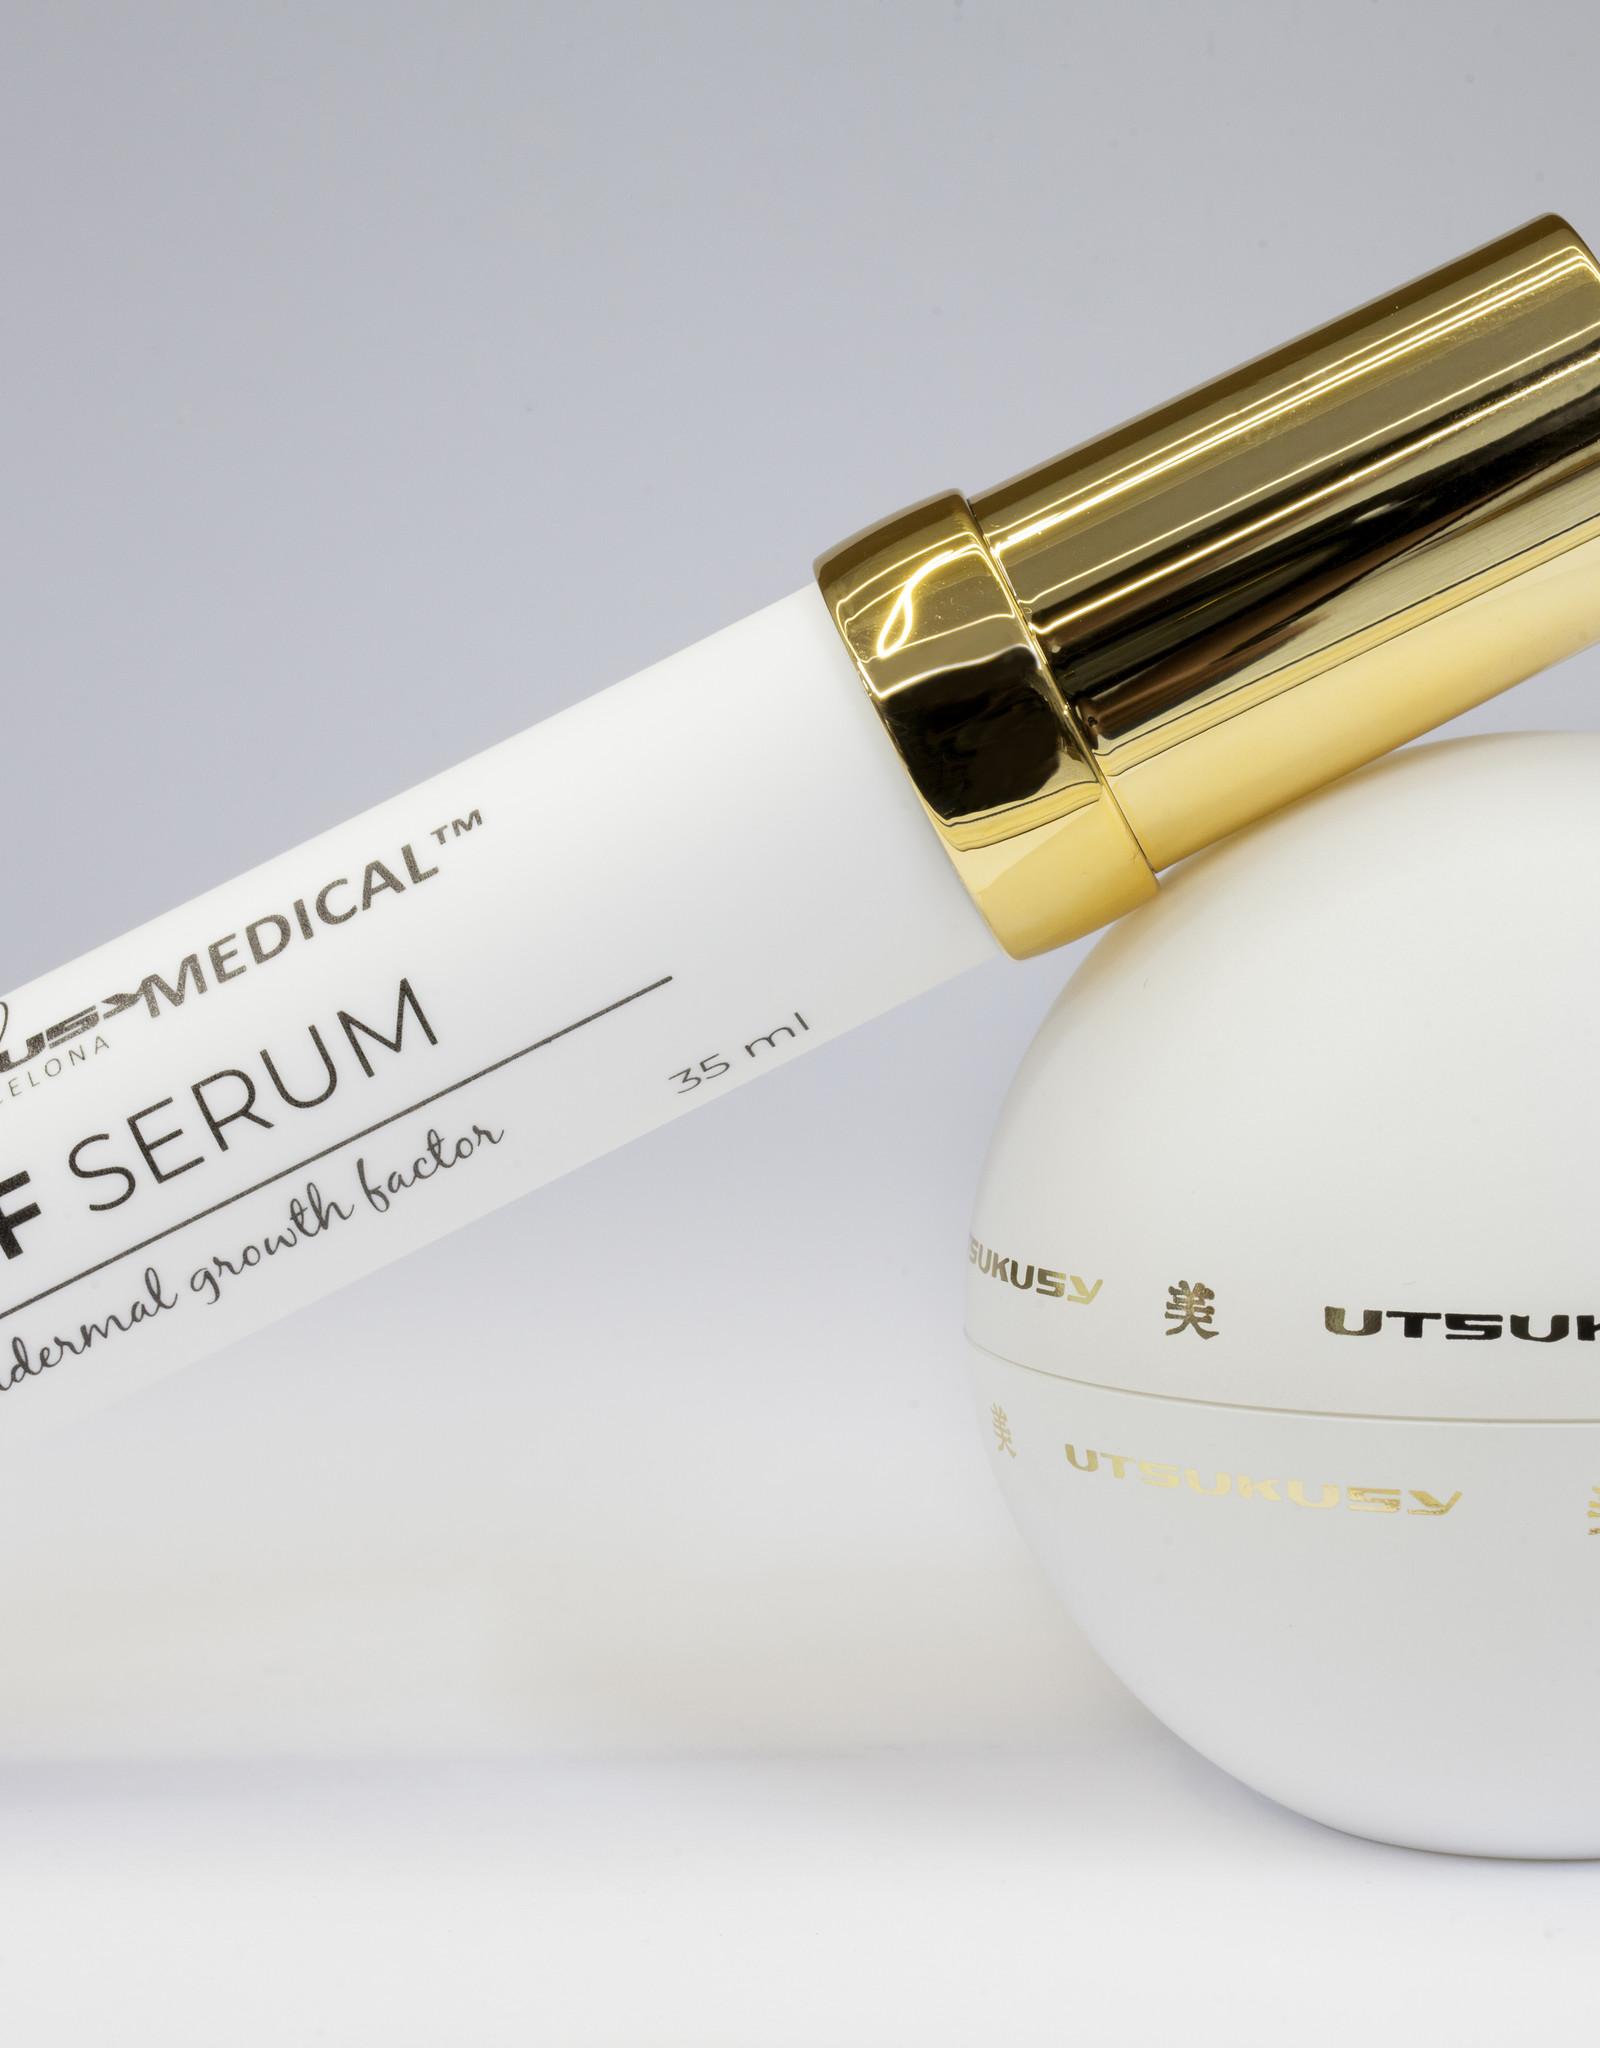 Utsukusy Plasma Skin EGF care kit